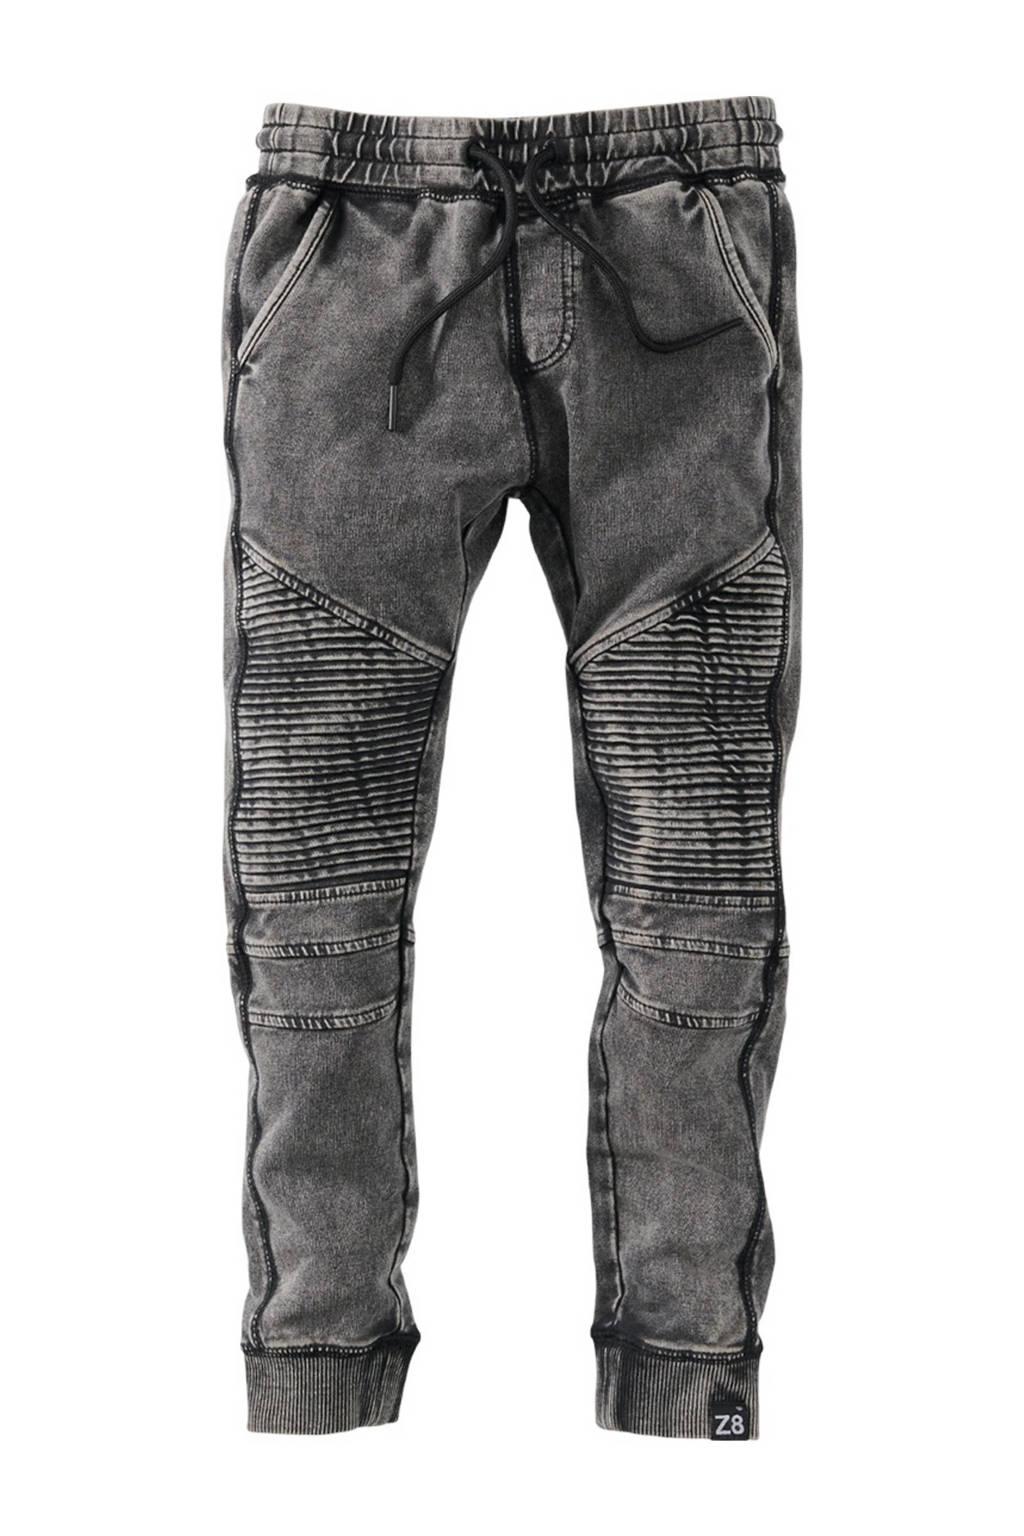 Z8 joggingbroek Dean S21 grijs stonewashed, Grijs stonewashed